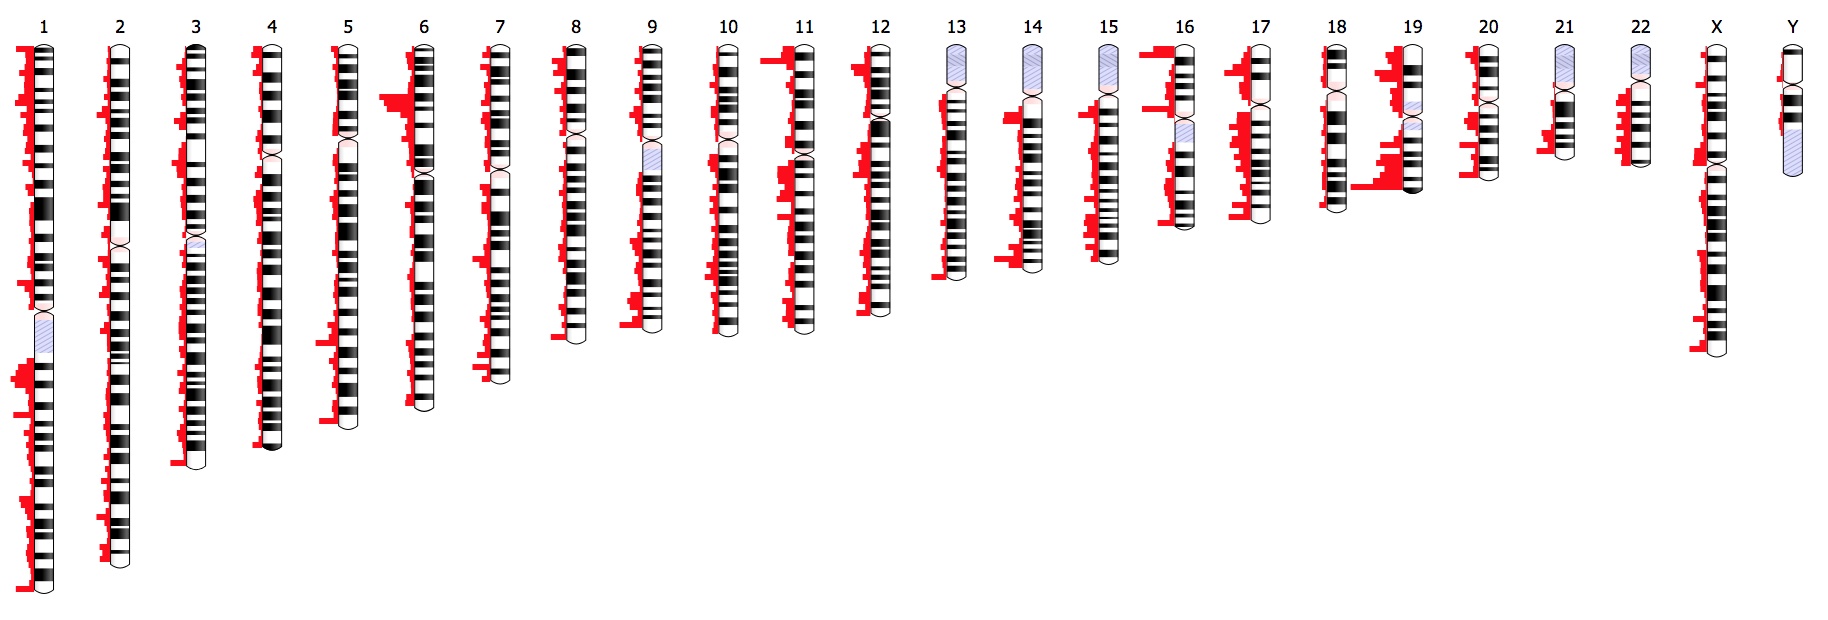 All human genes